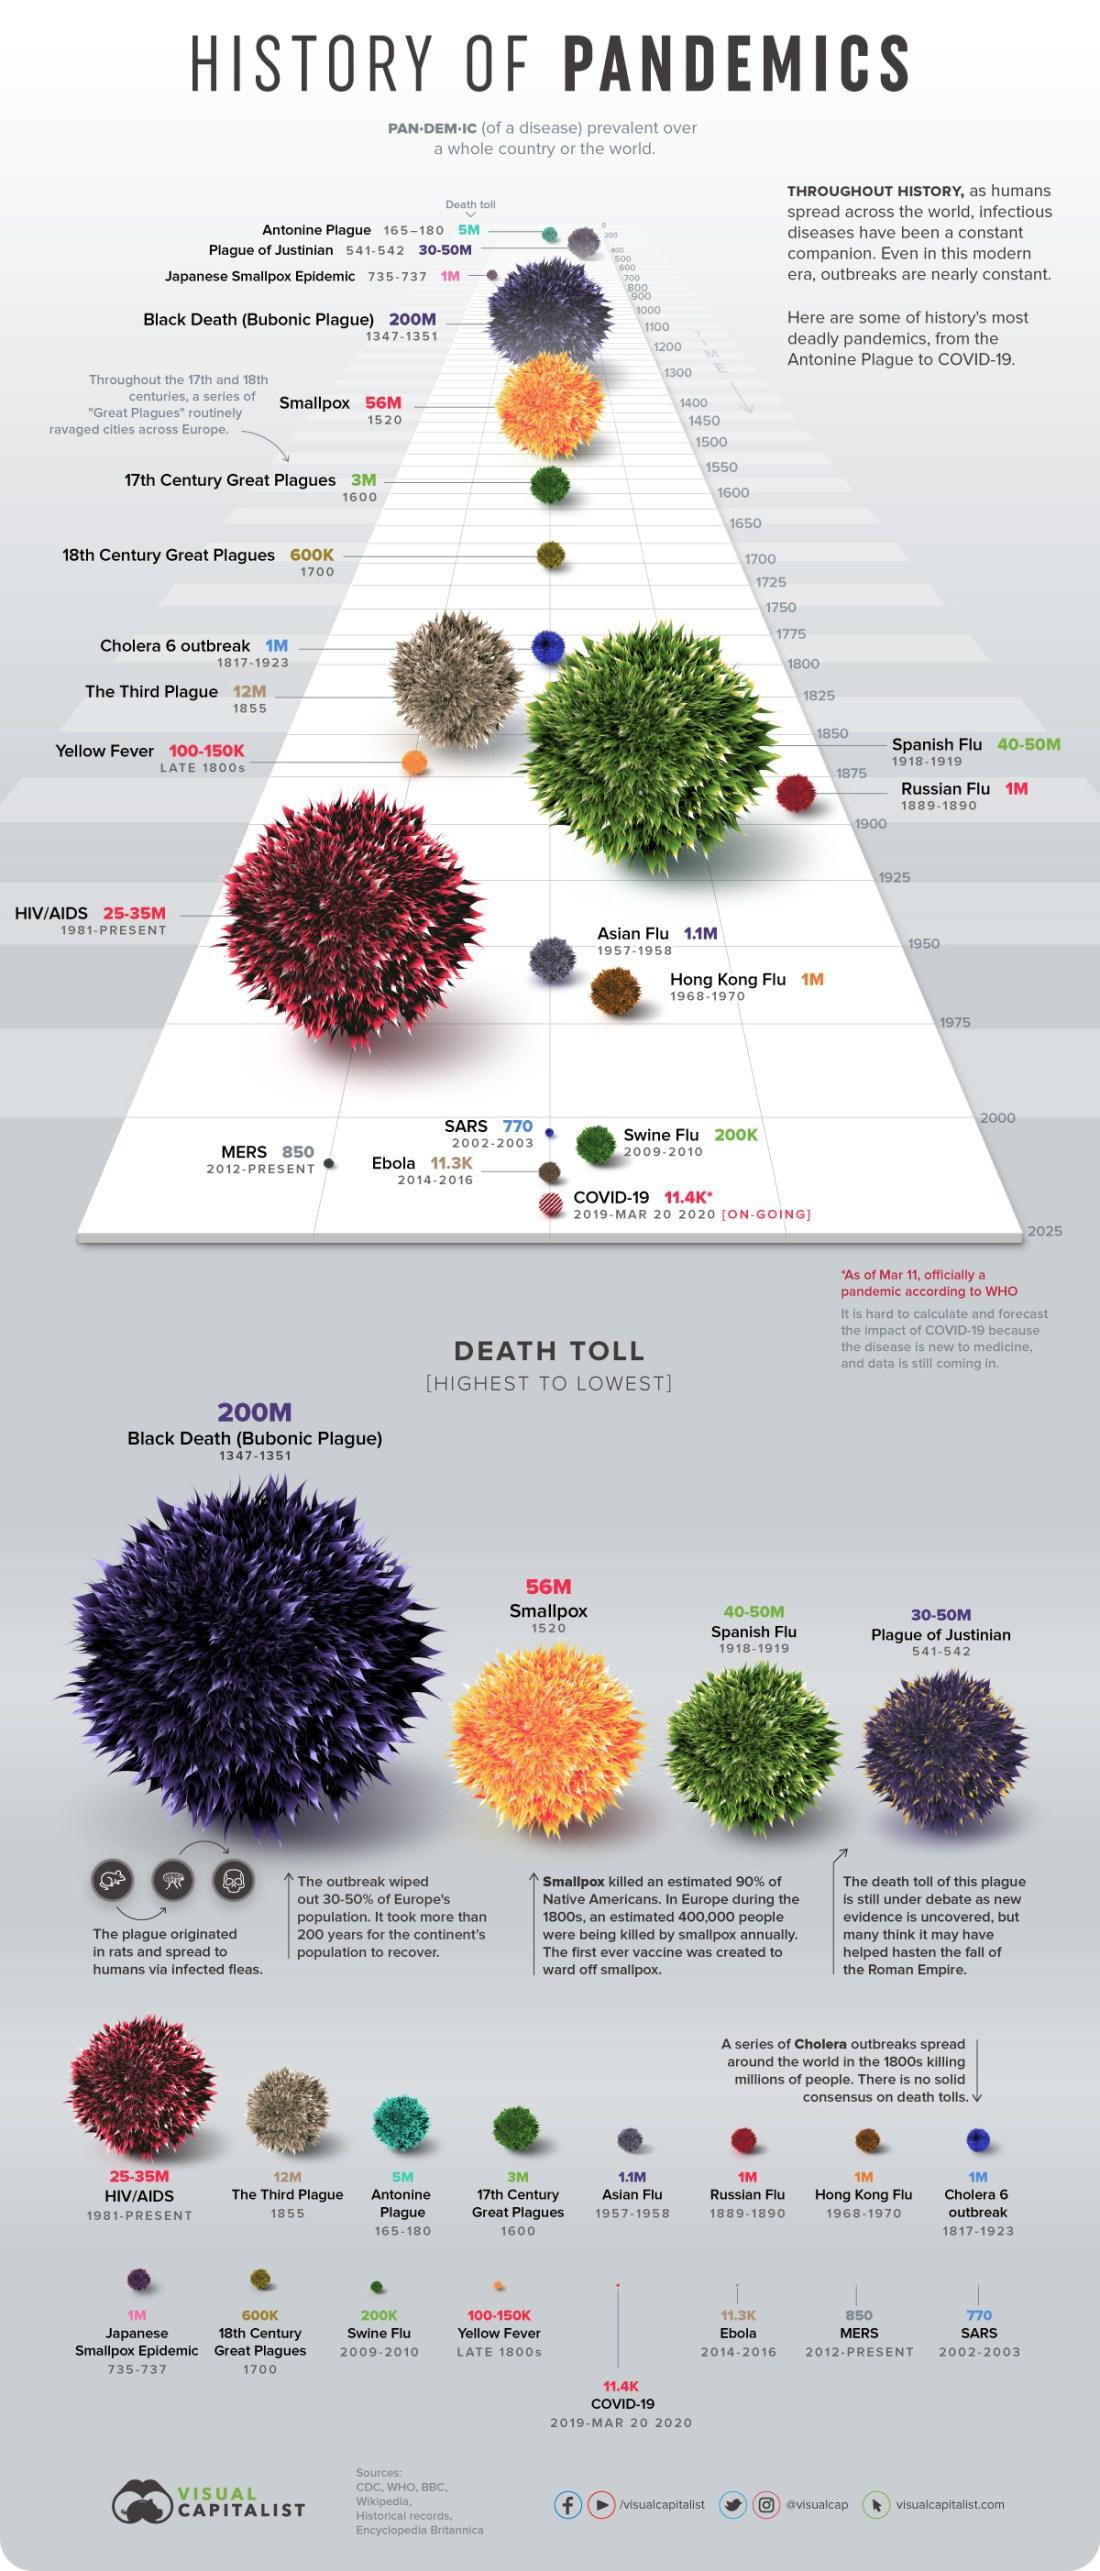 DeadliestPandemics-Infographic-13